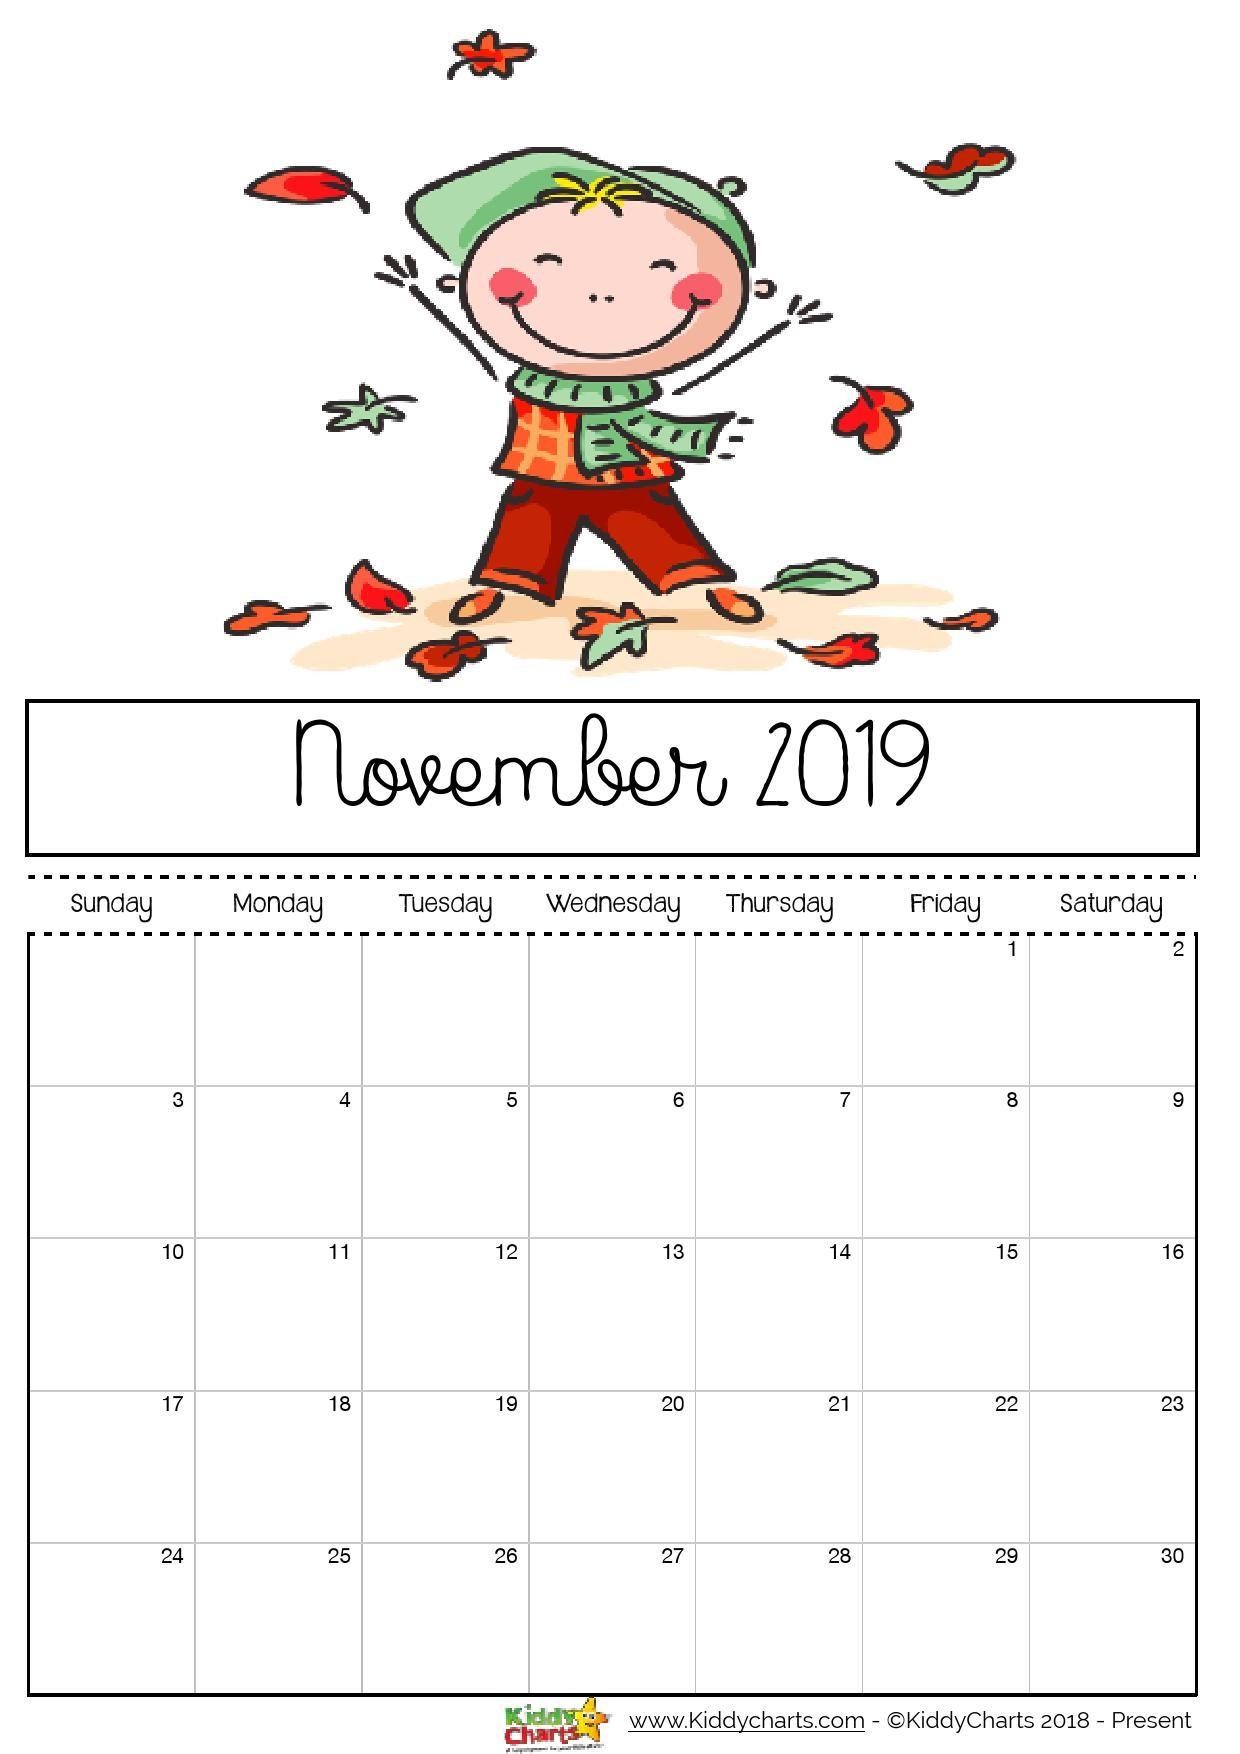 Printable Calendar 2019 for Kids Free Printable 2019 Calendar for Kids